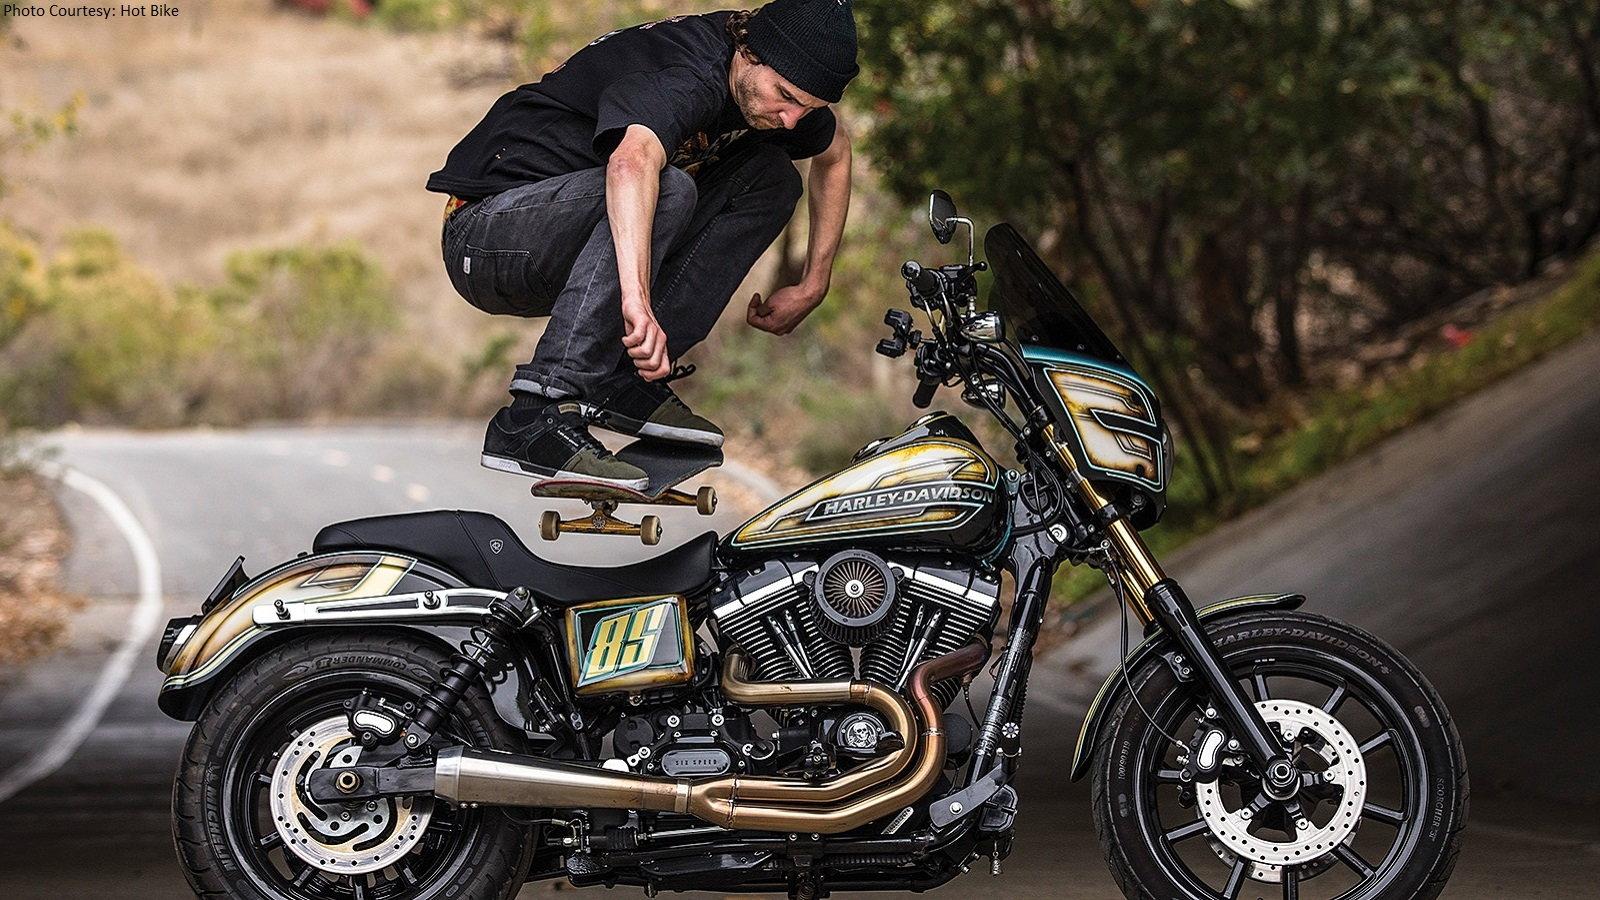 Skateboard Champ Rocks a Dyna Low Rider